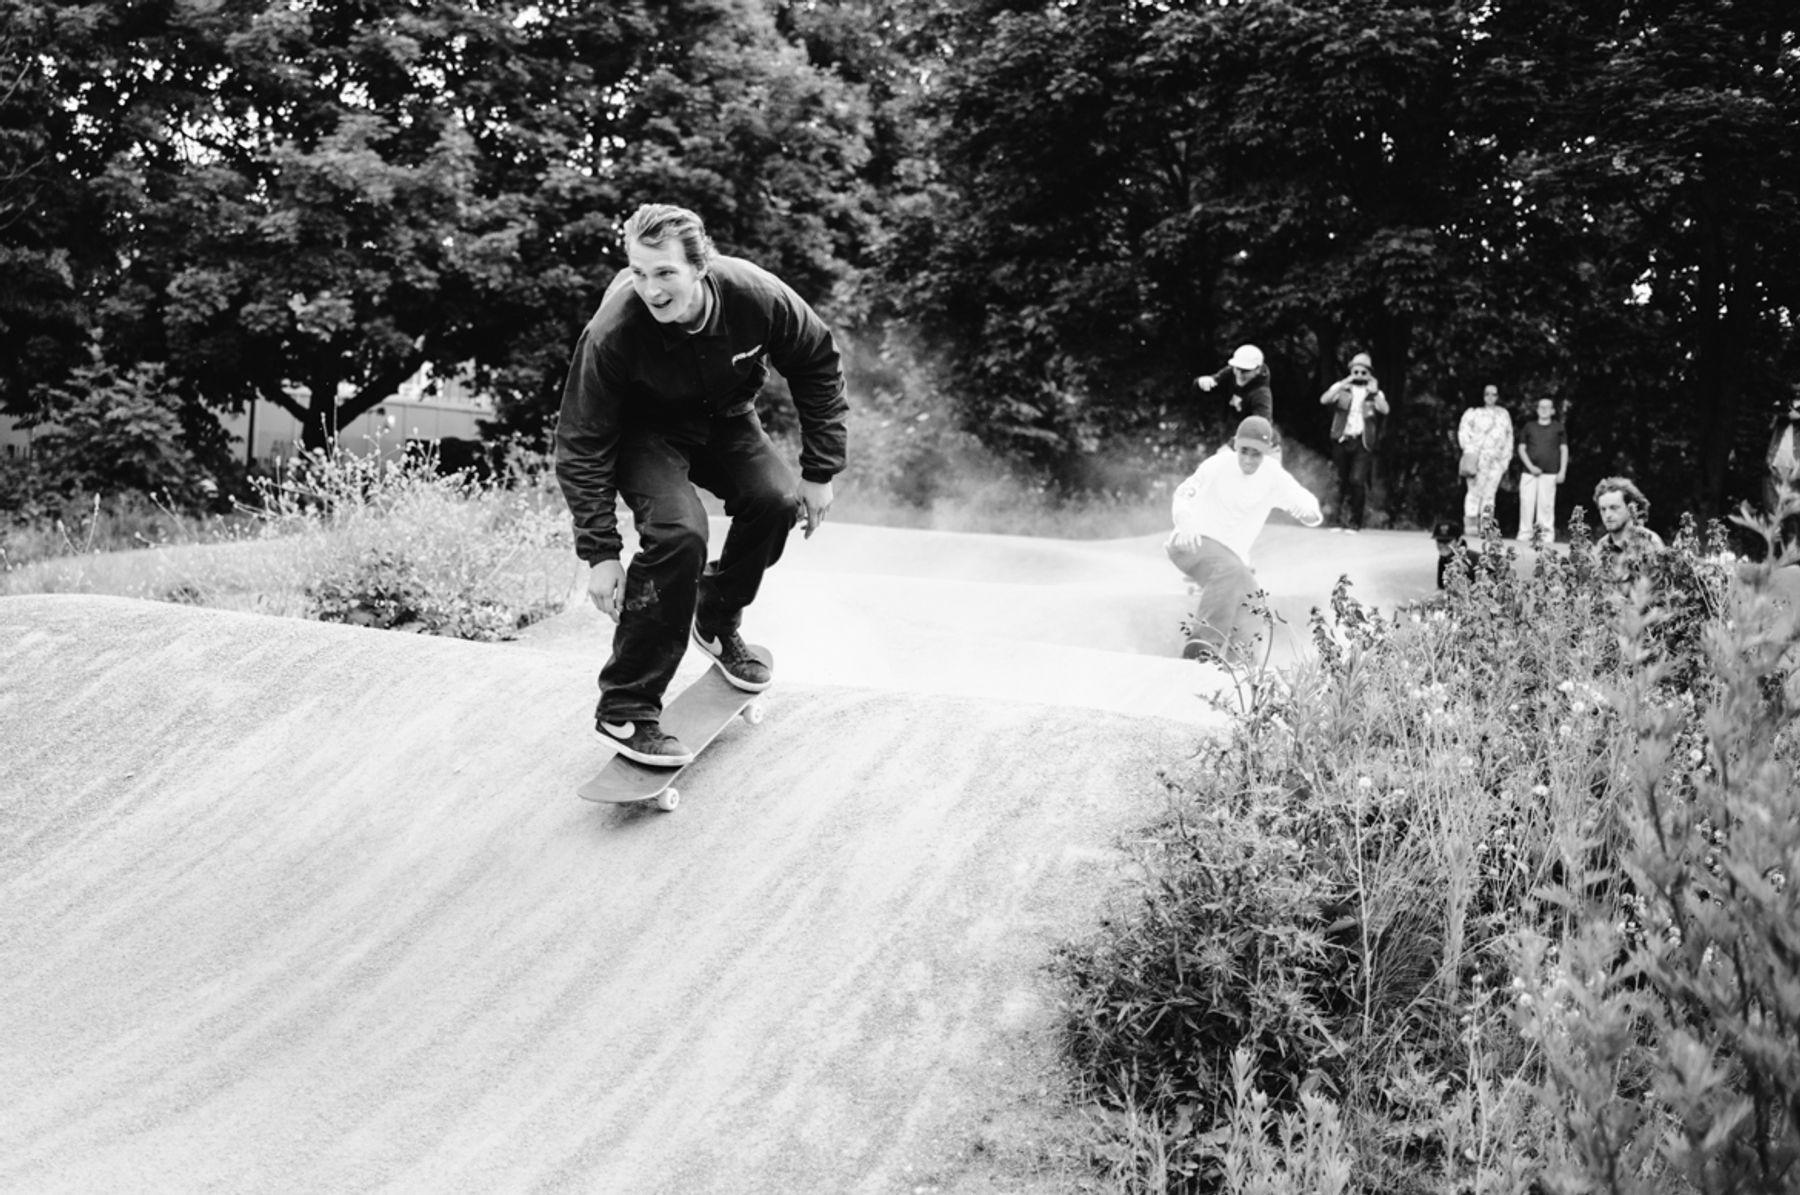 _IHC7808e-John-Fitzgerald-Kyron-Davis-Nike-SB-x-Slam-City-Skates-Go-Skateboarding-Day-London-June-2015-Photographer-Maksim-Kalanep